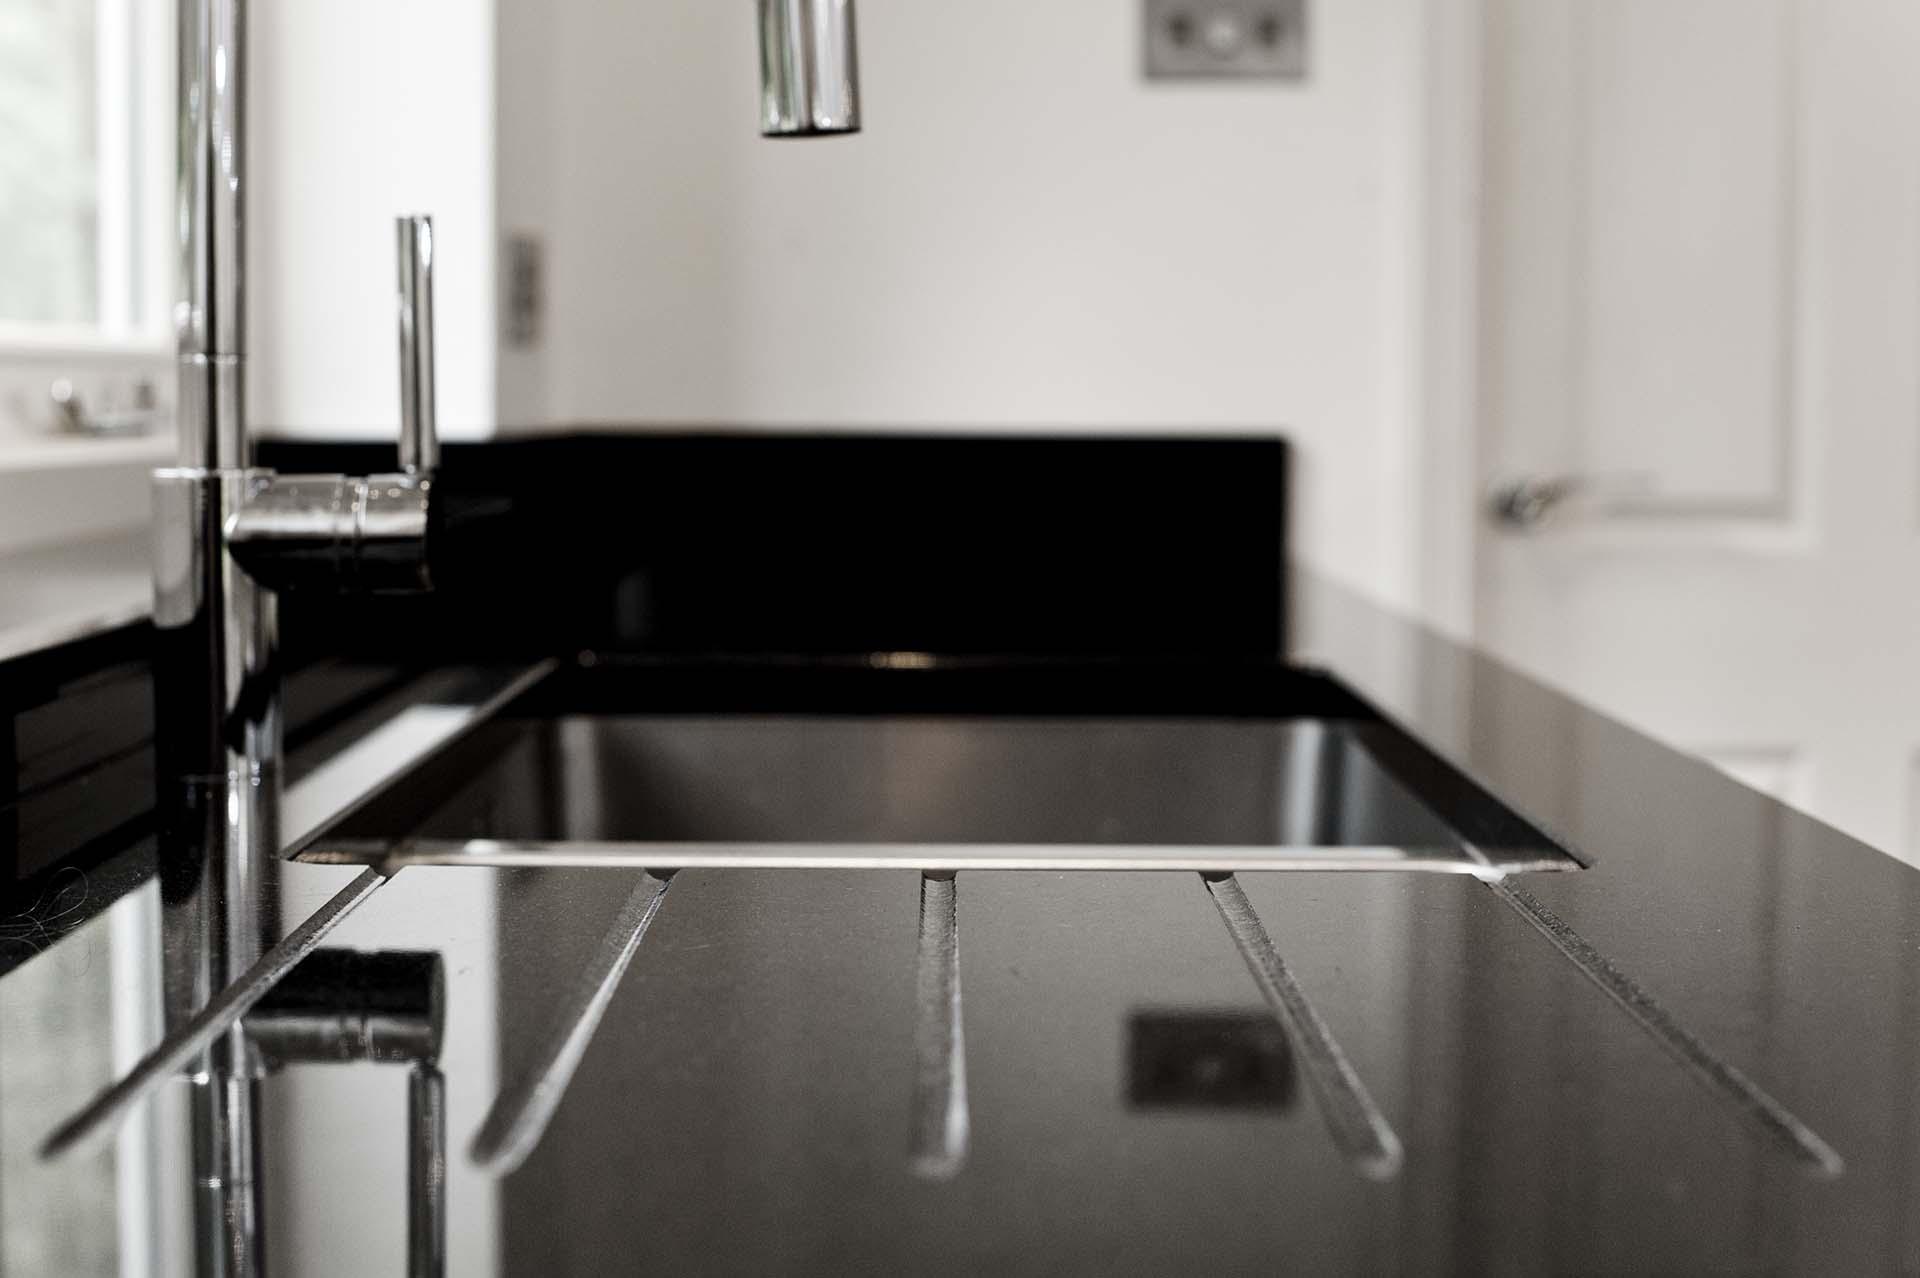 granite and quartz nero assoluto granite worktops cimstone lapland quartz_white_sparkly_black_140331103232a red